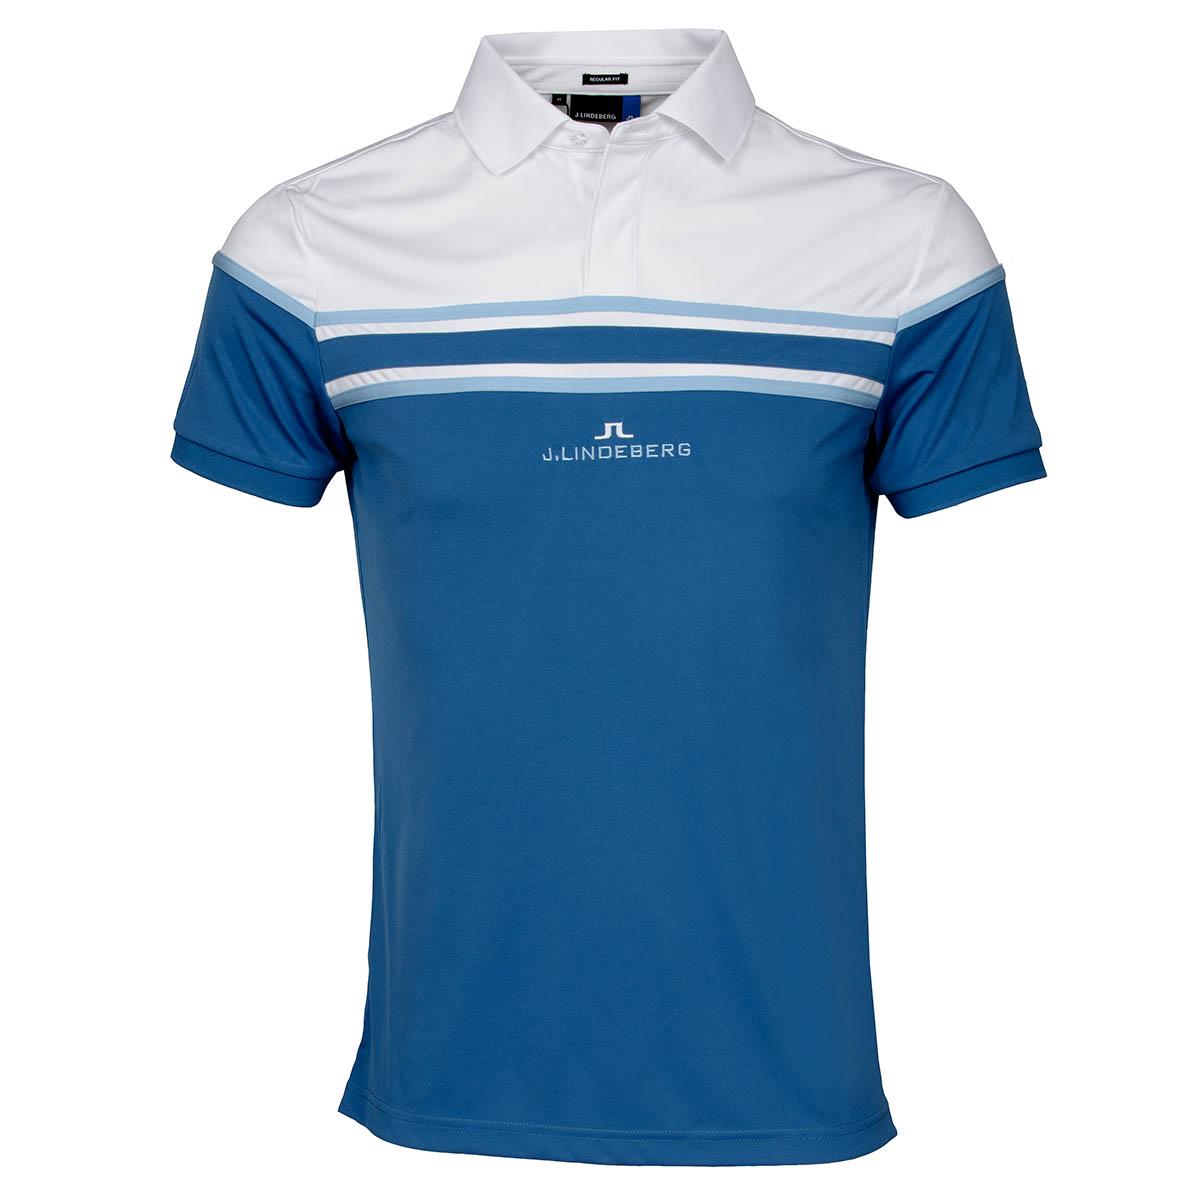 J lindeberg arkell tx polo shirt blue dust scottsdale golf for Texas a m golf shirt